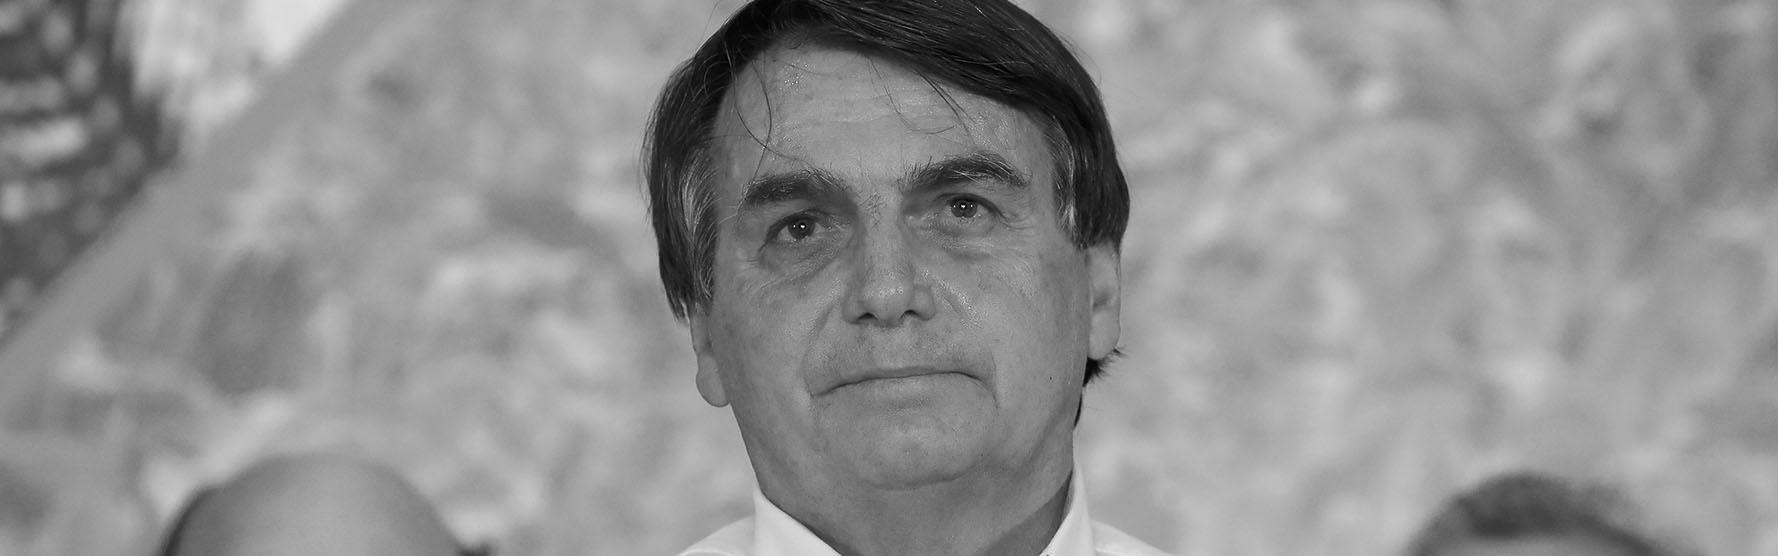 Reuter's Report: As fires burn, Bolsonaro touts Brazil's environment